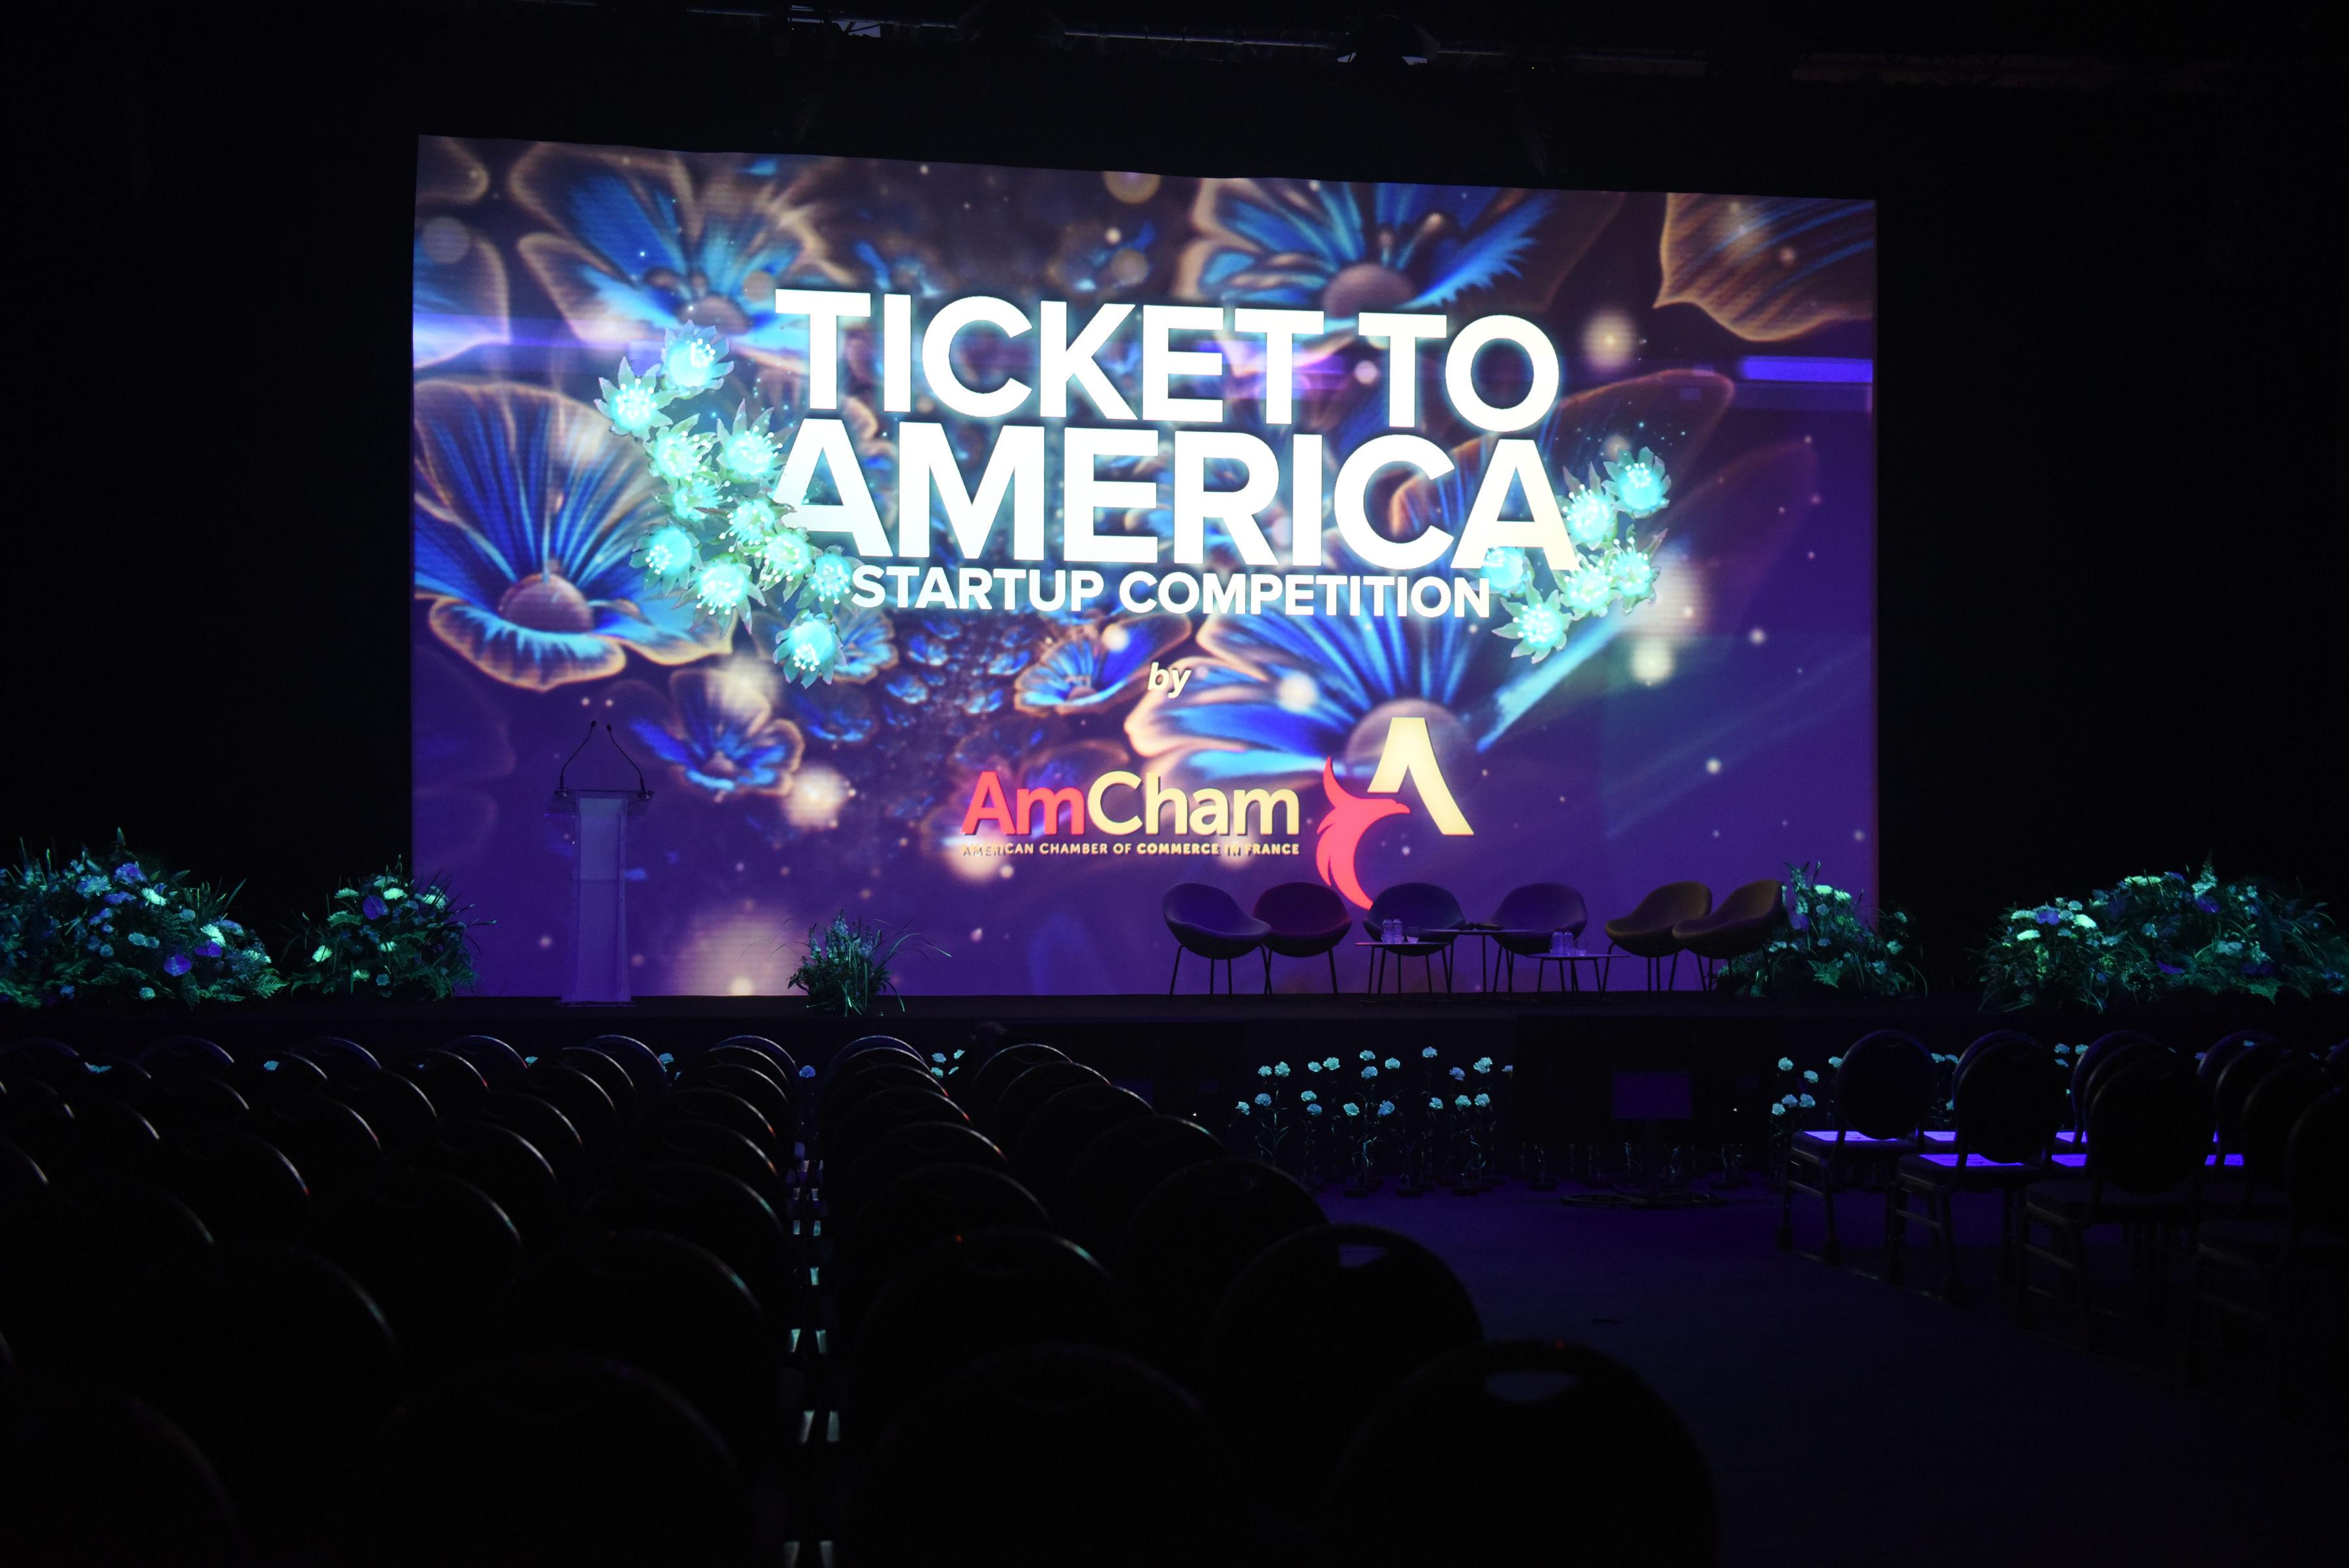 Scène_Disney_Ticket_to_America